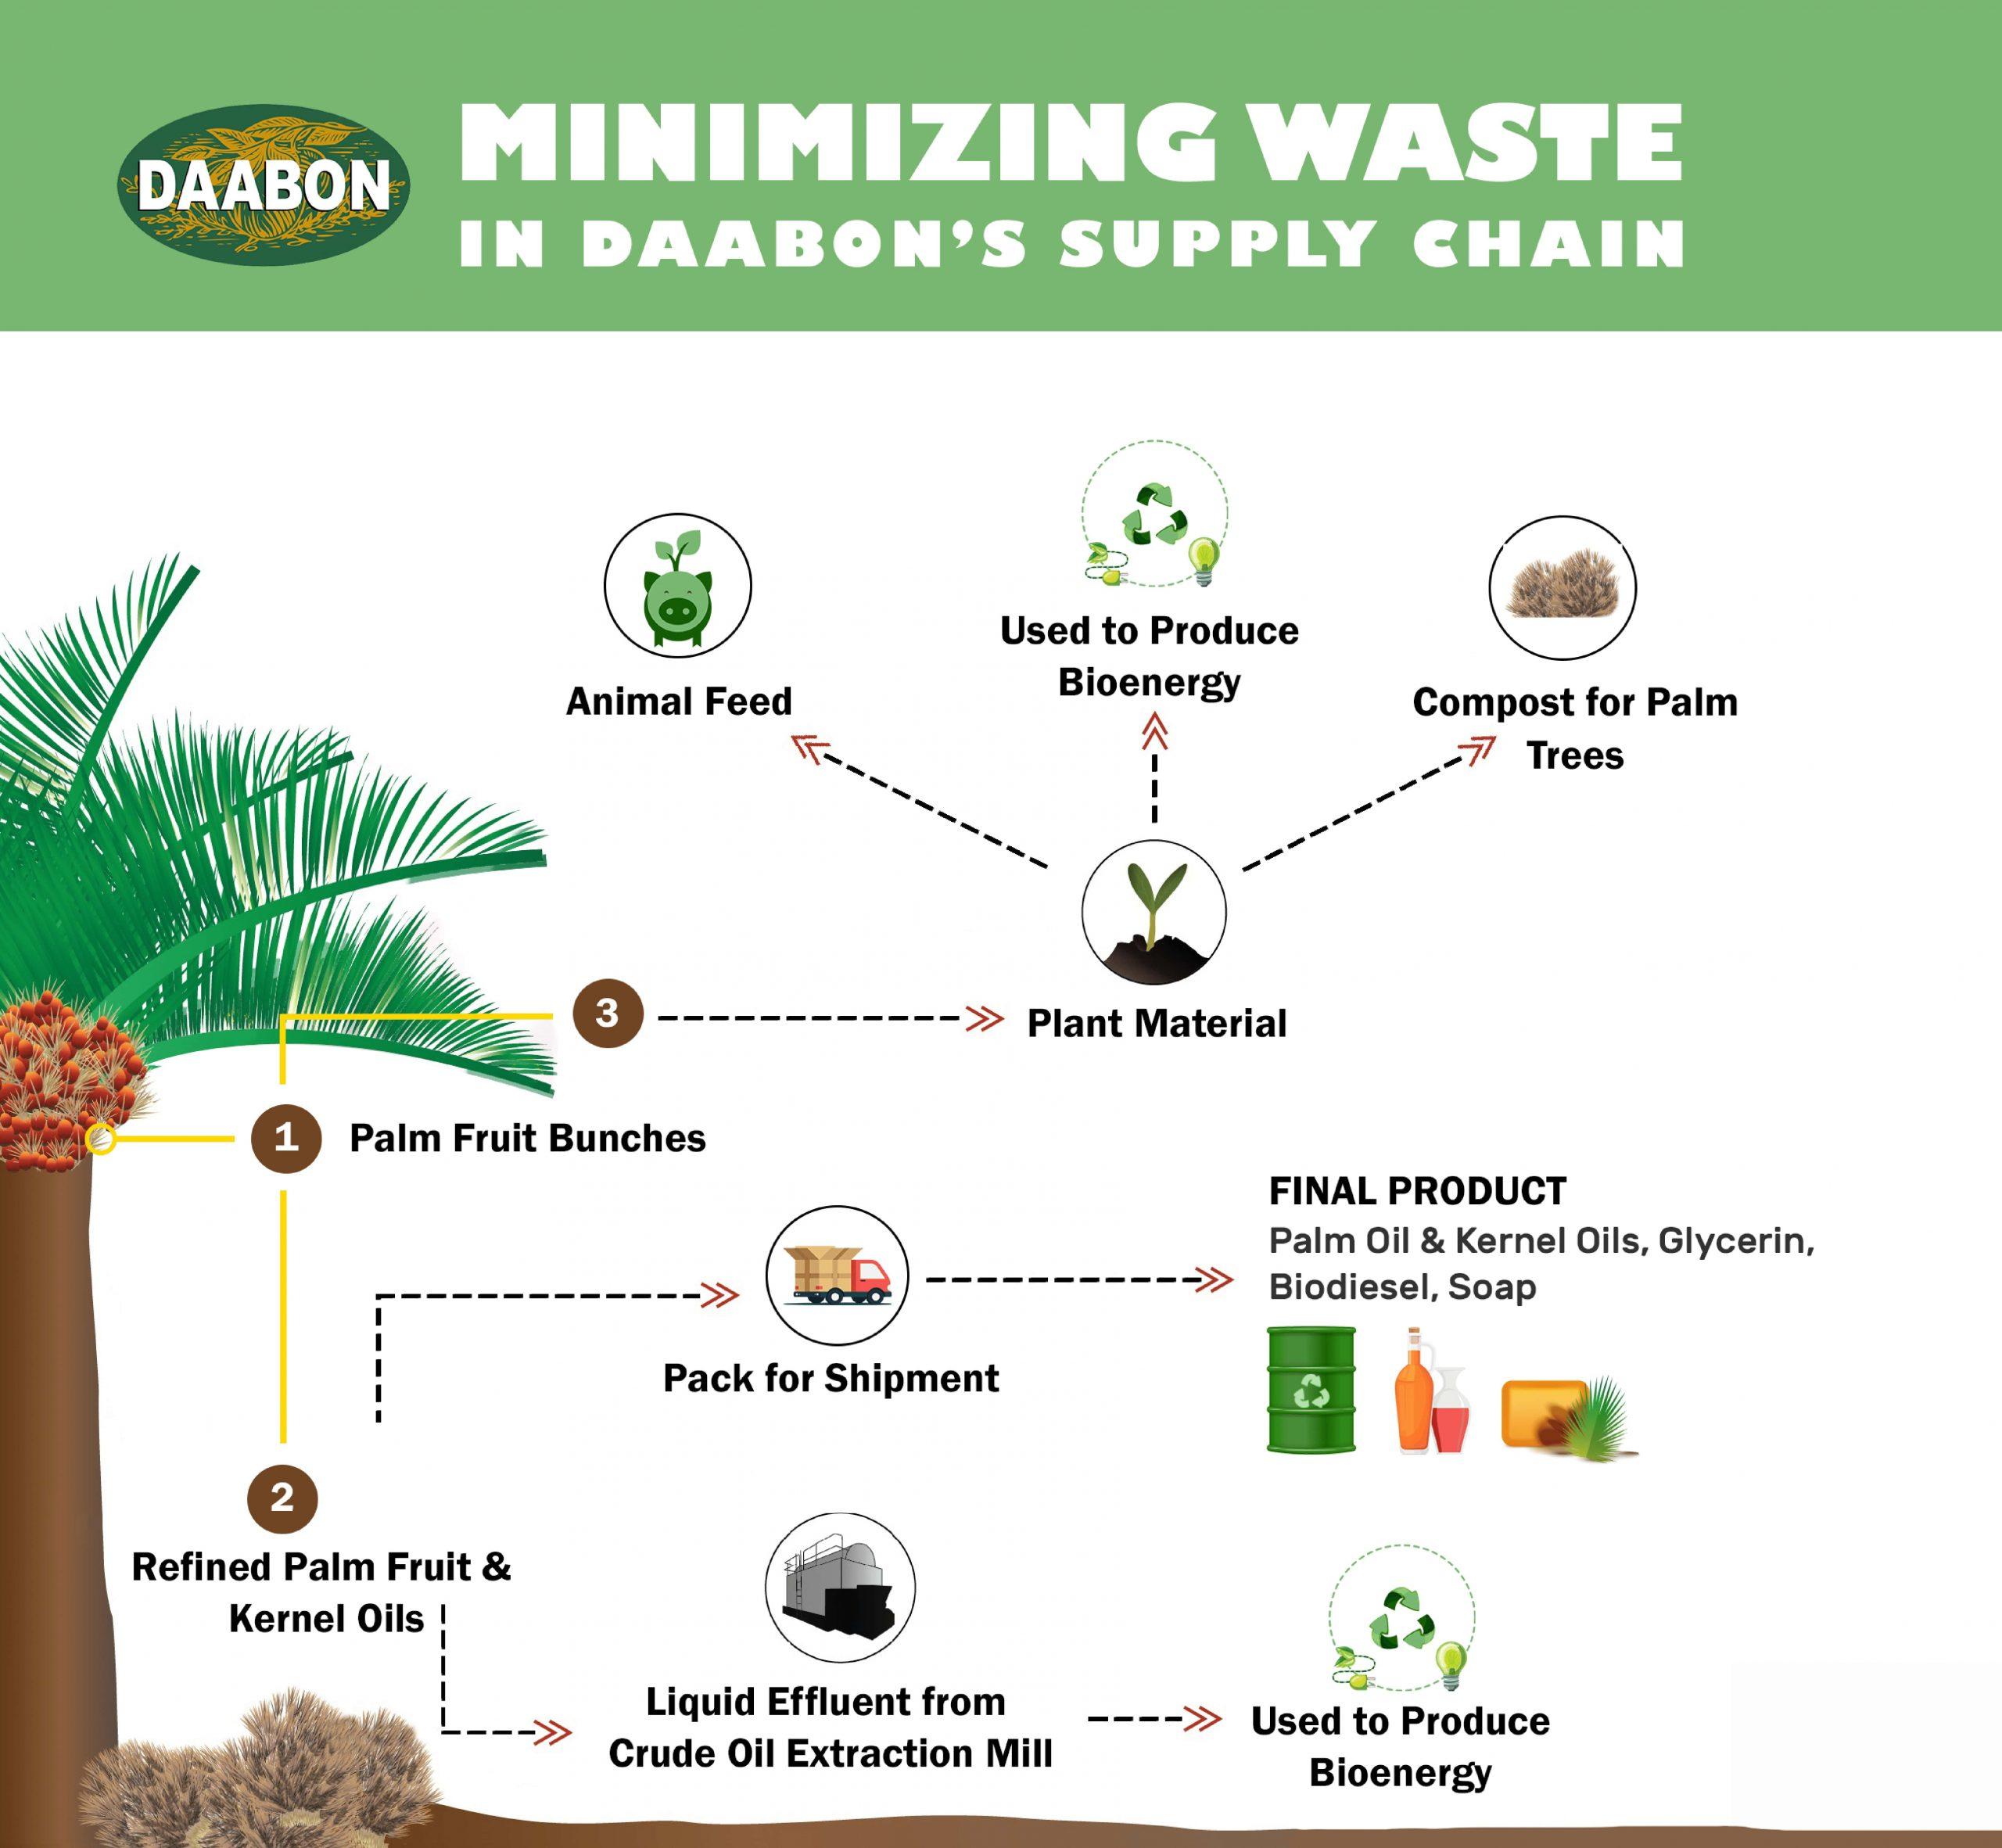 minimizing-waste-daabon-supply-chain